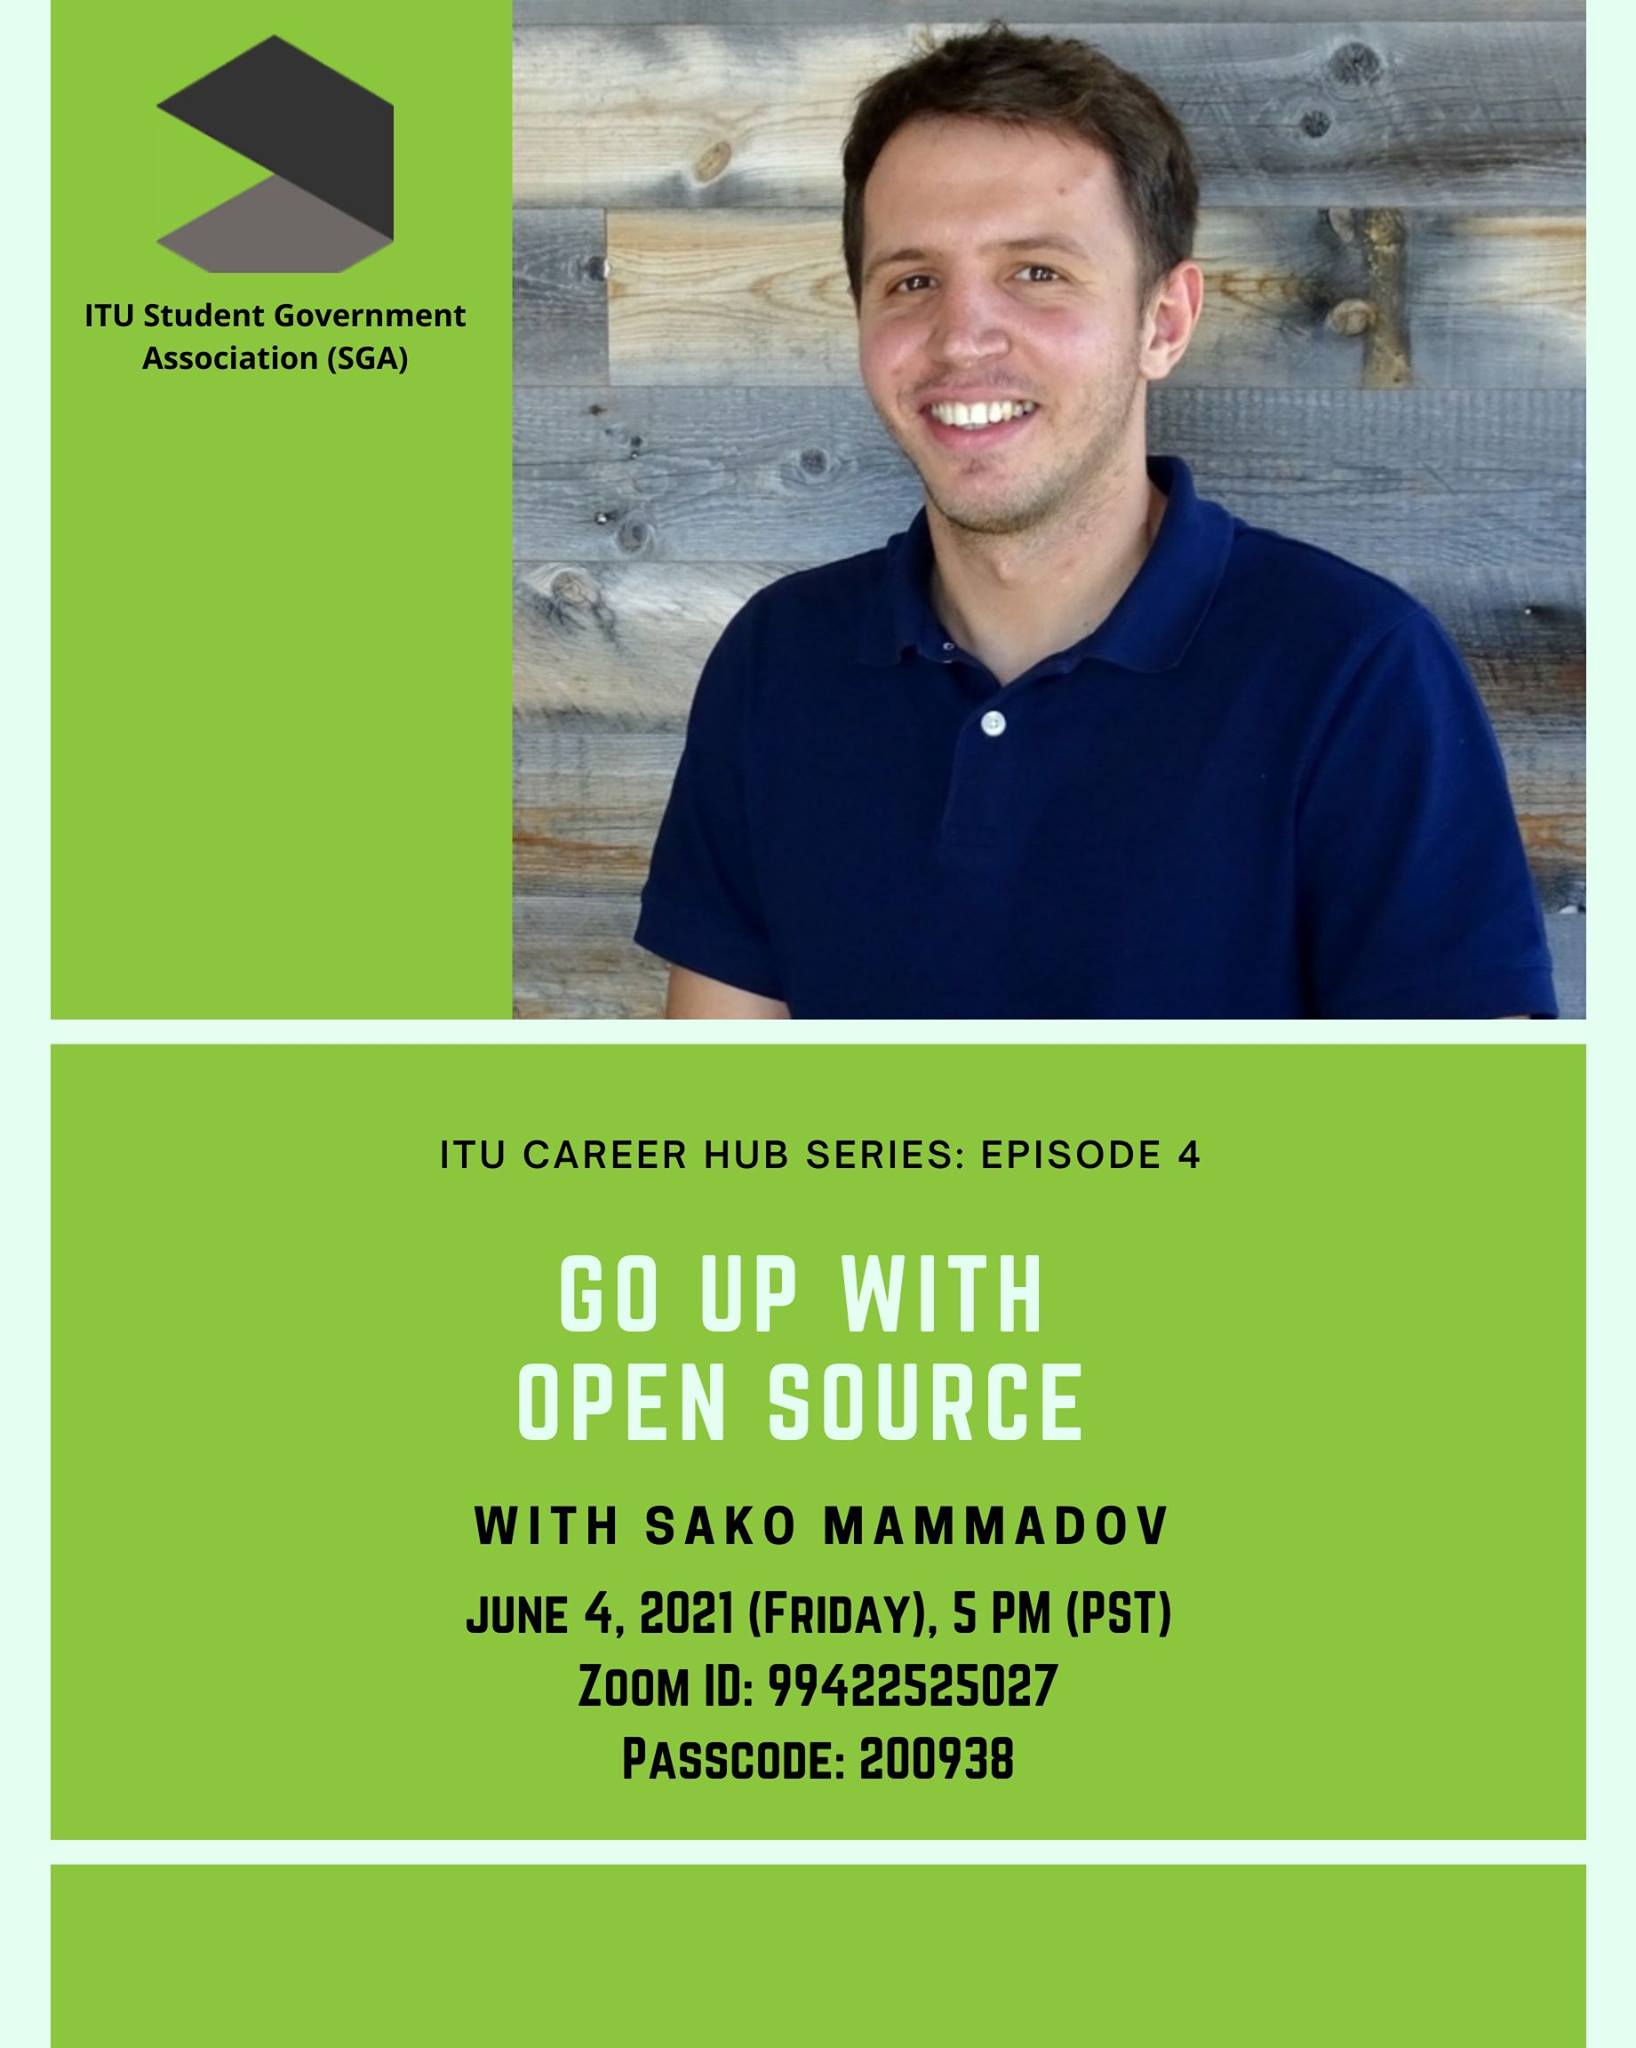 ITU Career Hub Series Episode 4 with Sako Mammadov!